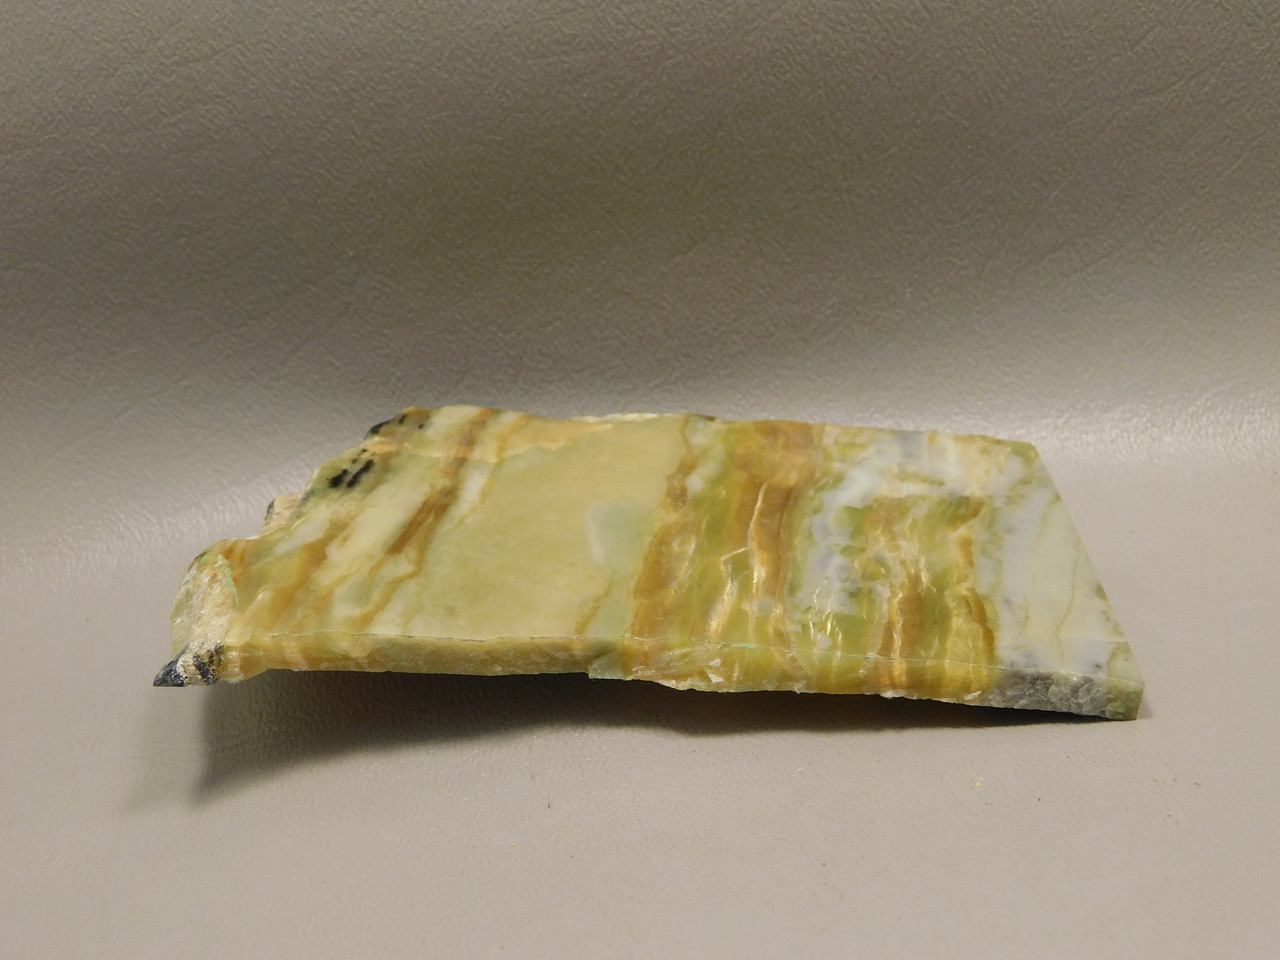 Arizona Pietersite Polished Stone Slab Chatoyant 4.25 inch Tiger Eye #O3